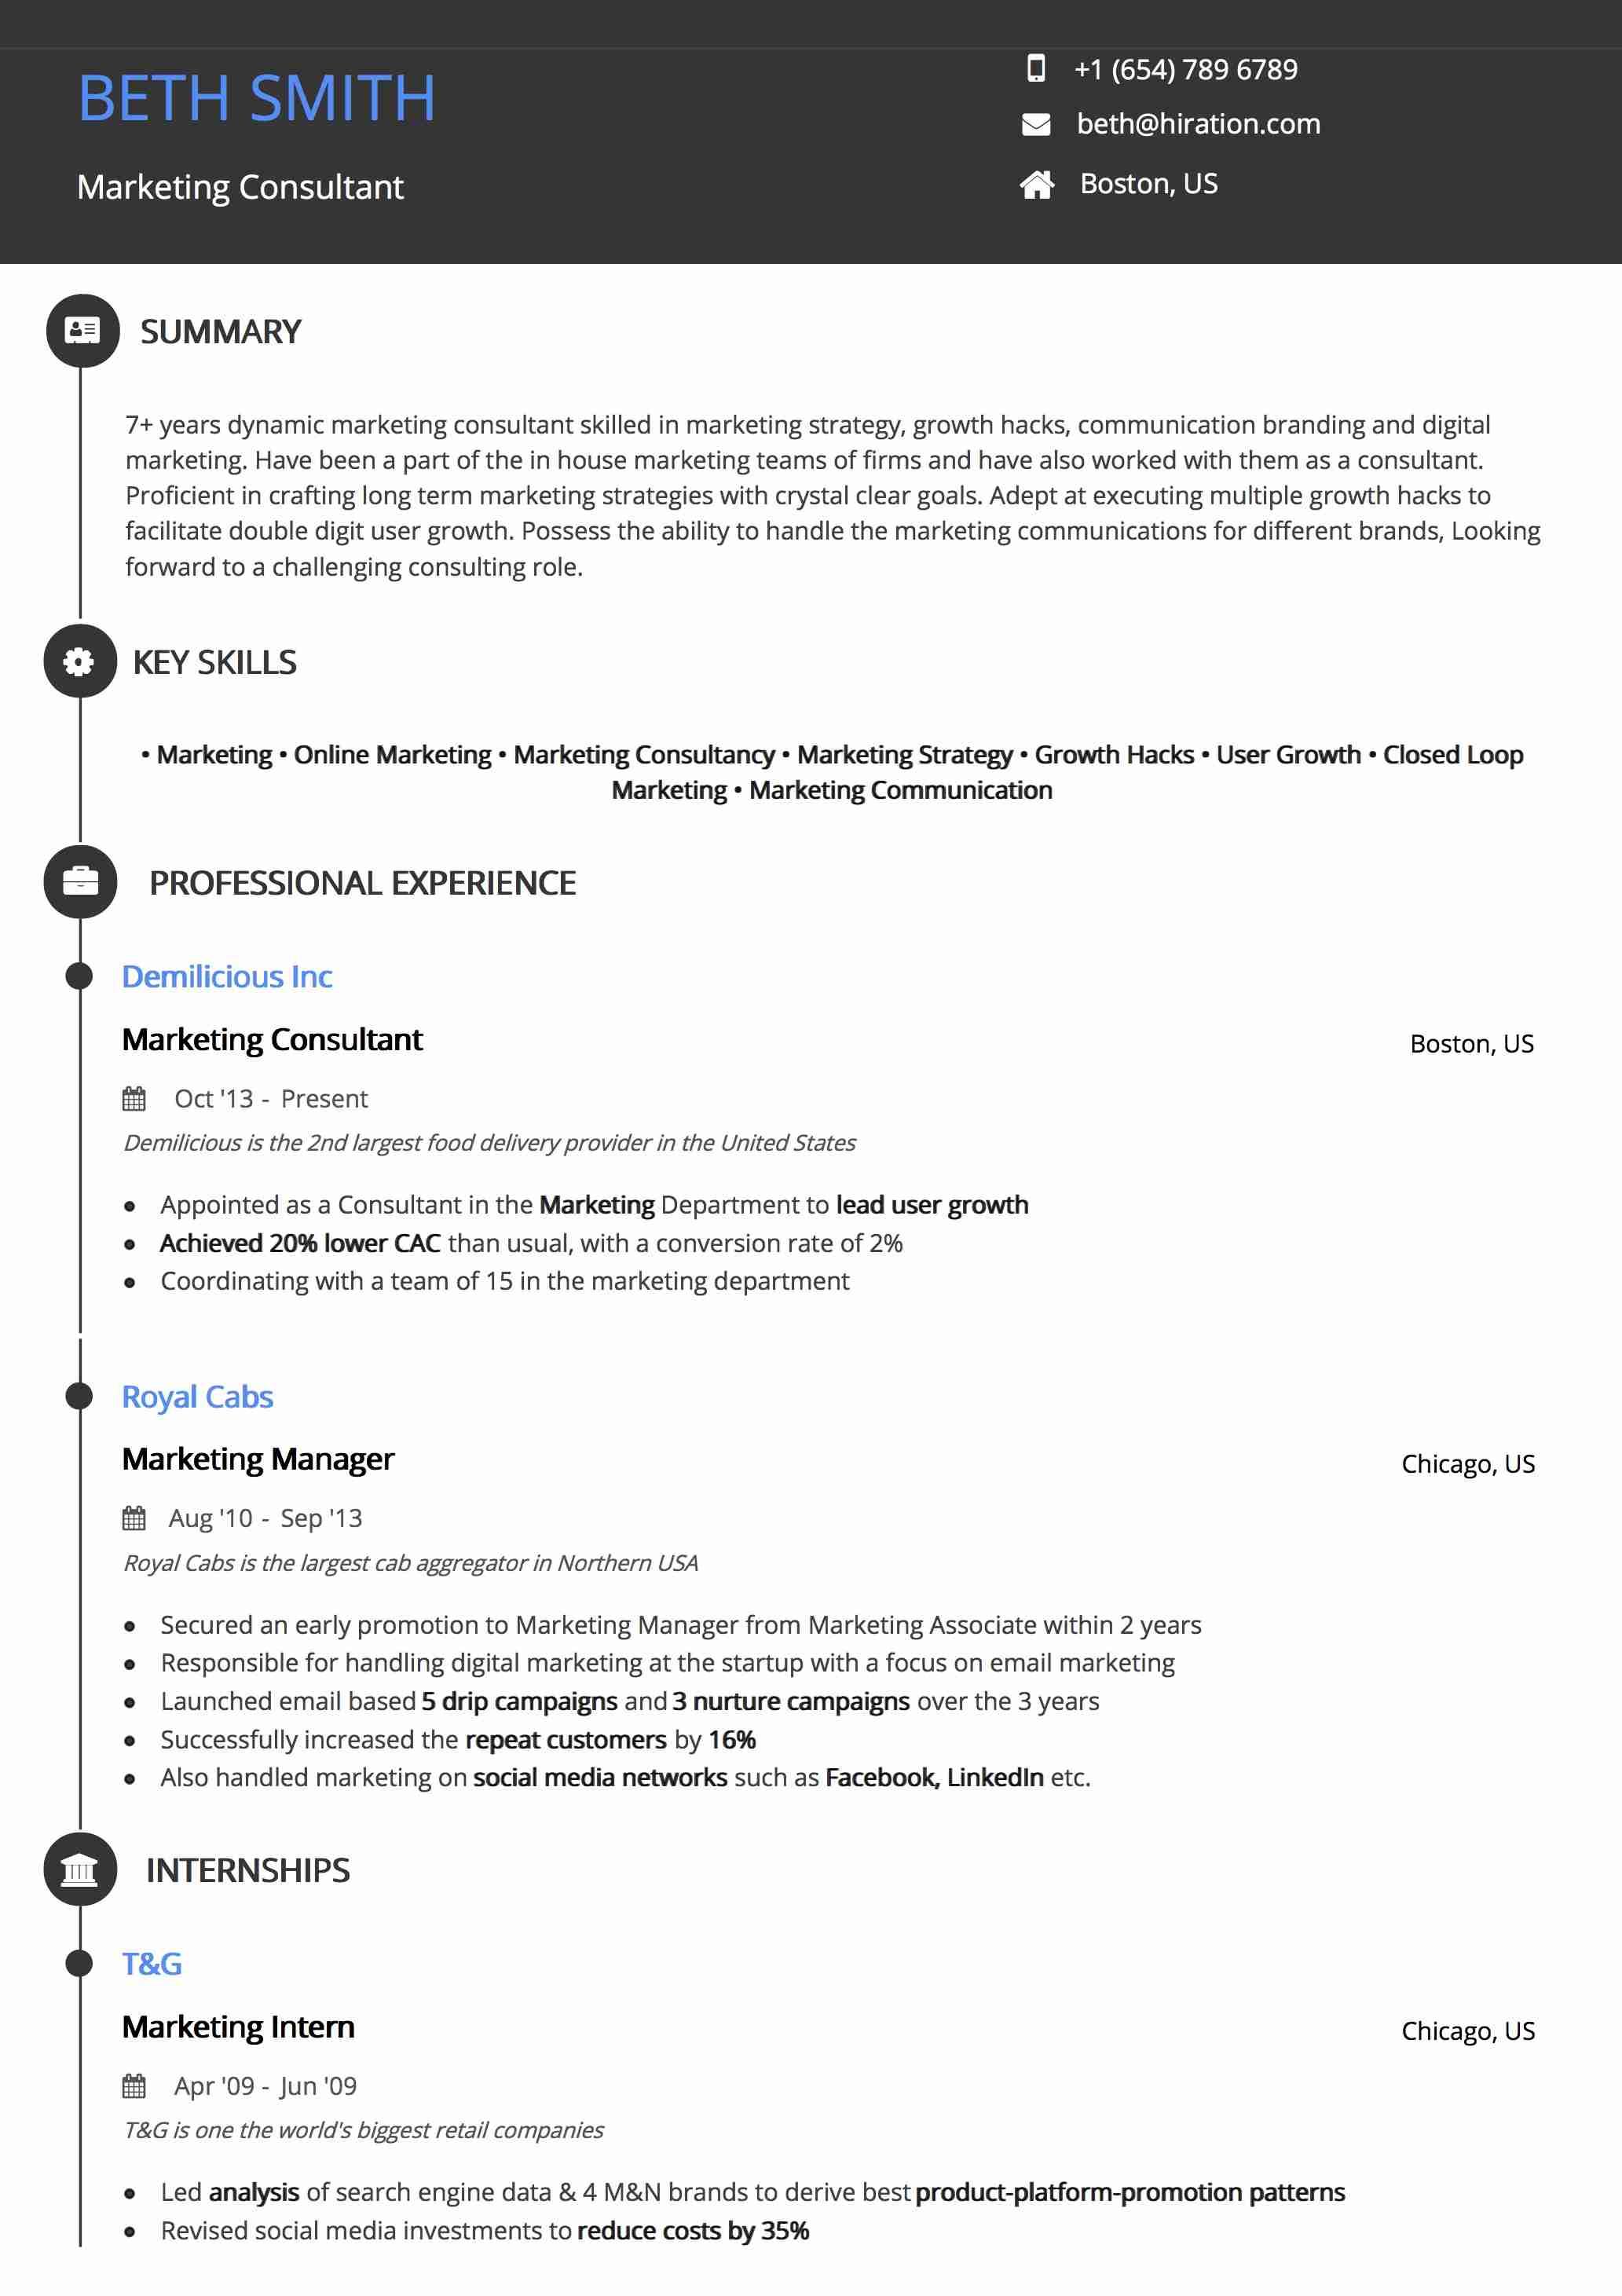 Resume Template: Round Timeline